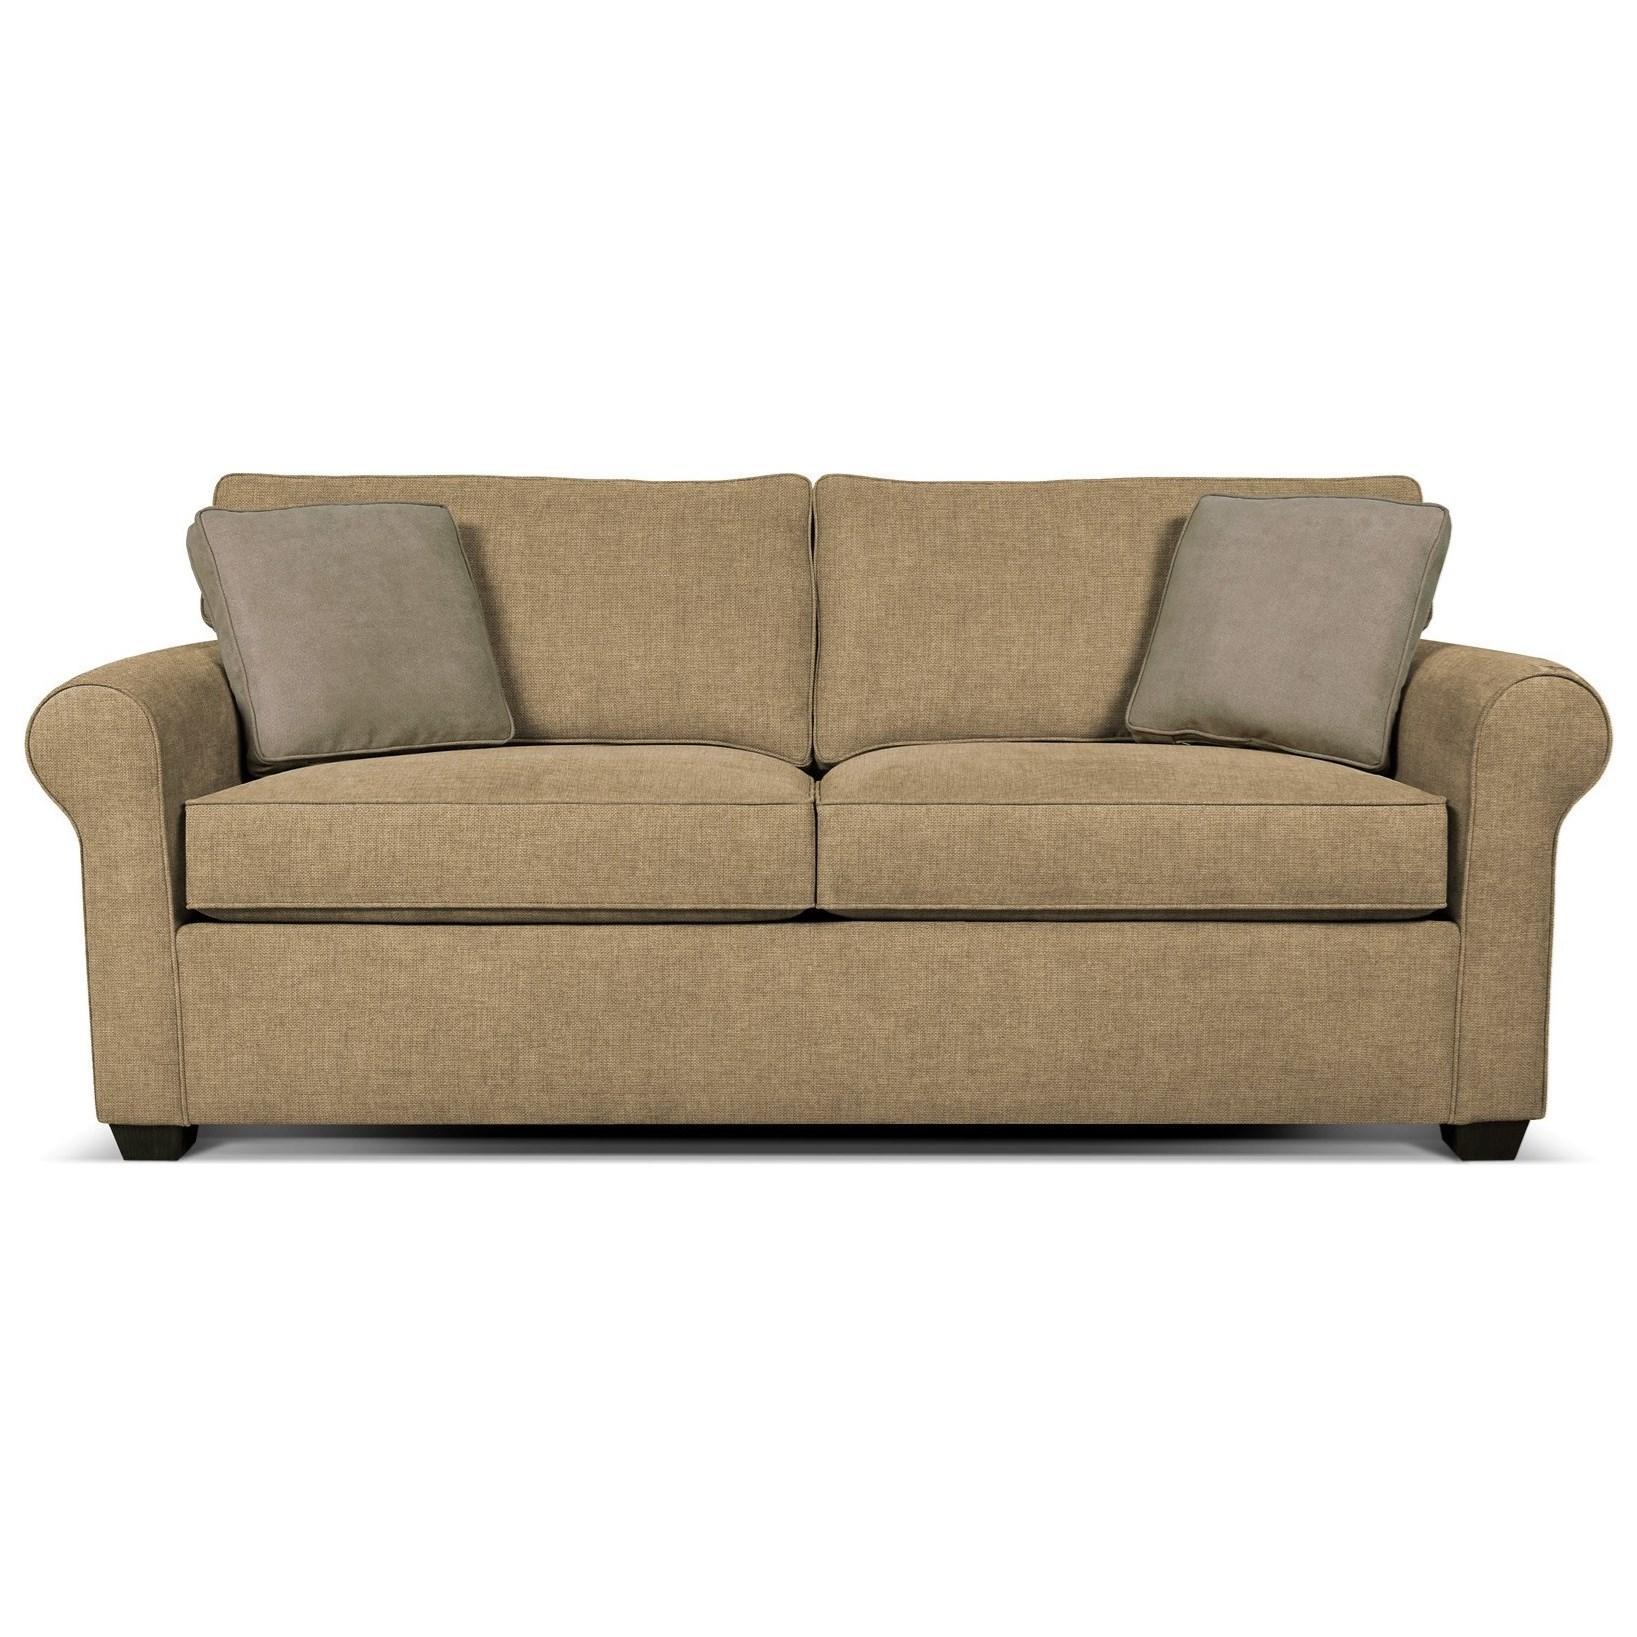 England Seabury Air Mattress Queen Size Sofa Sleeper With Casual Style